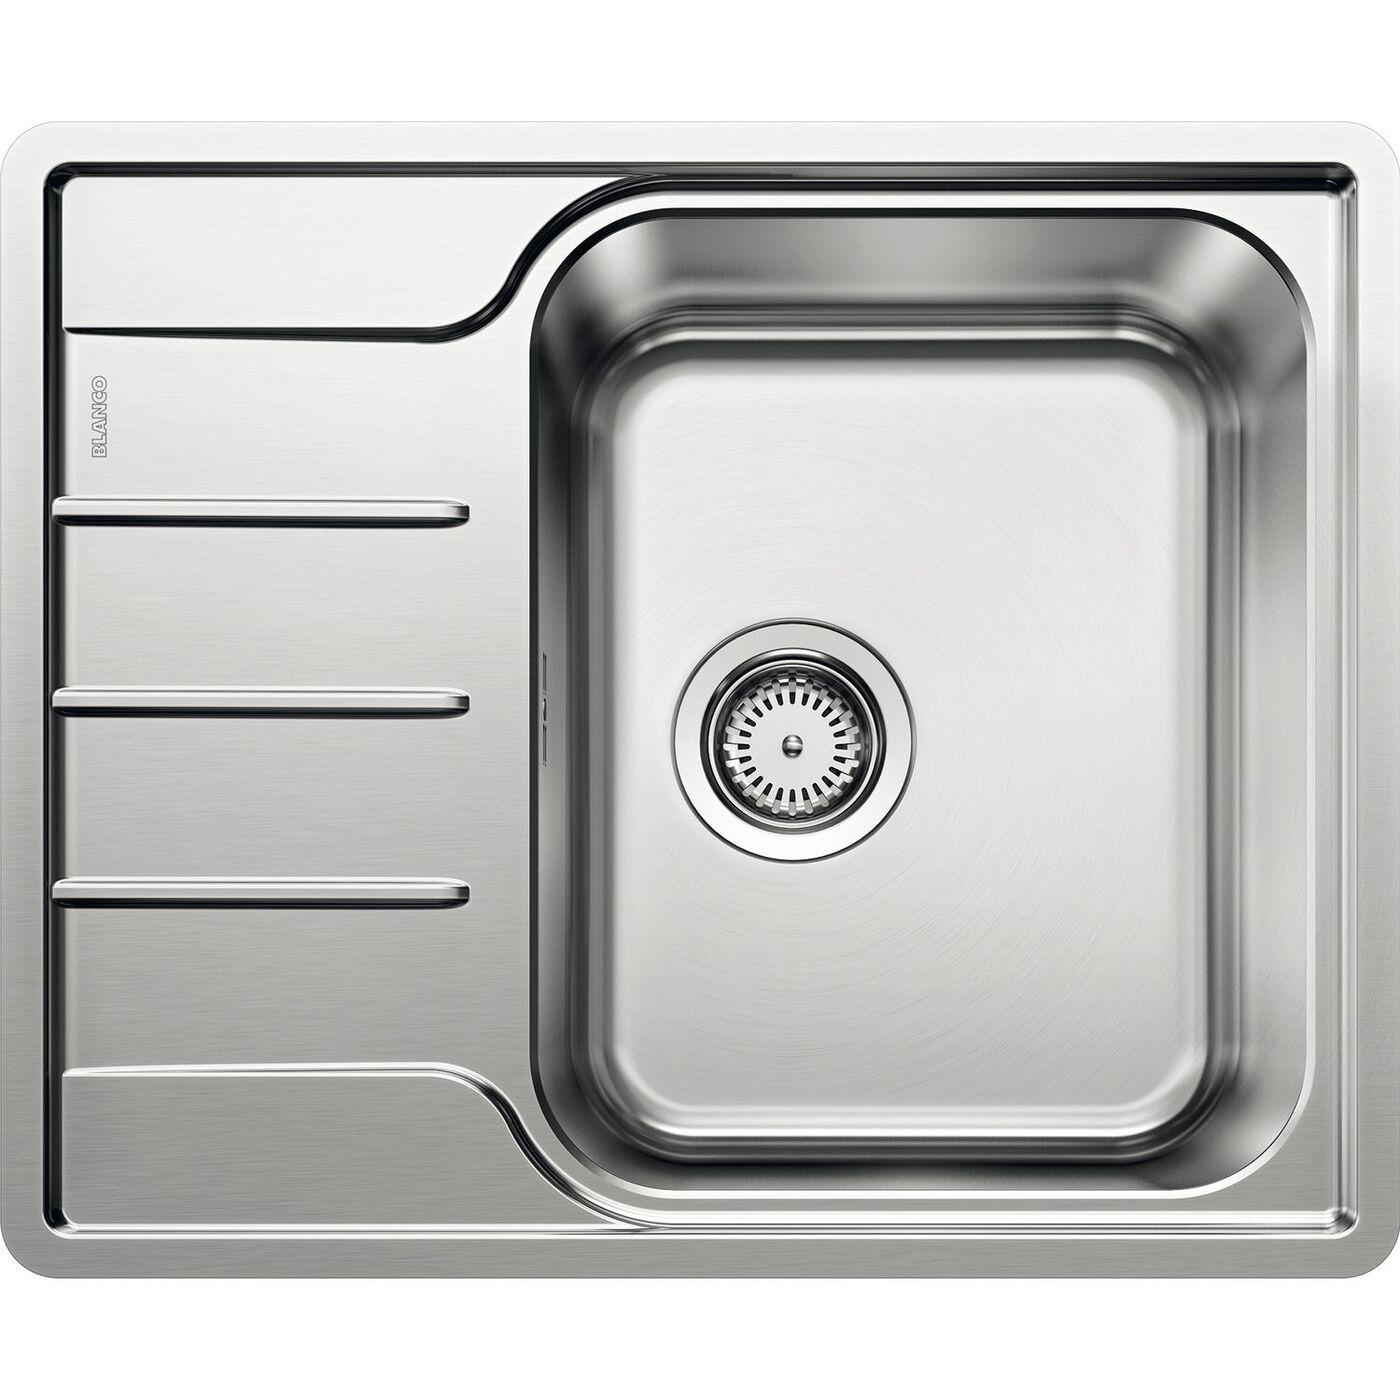 Кухонная мойка Blanco LEMIS 45 S-IF Mini нержавеющая сталь